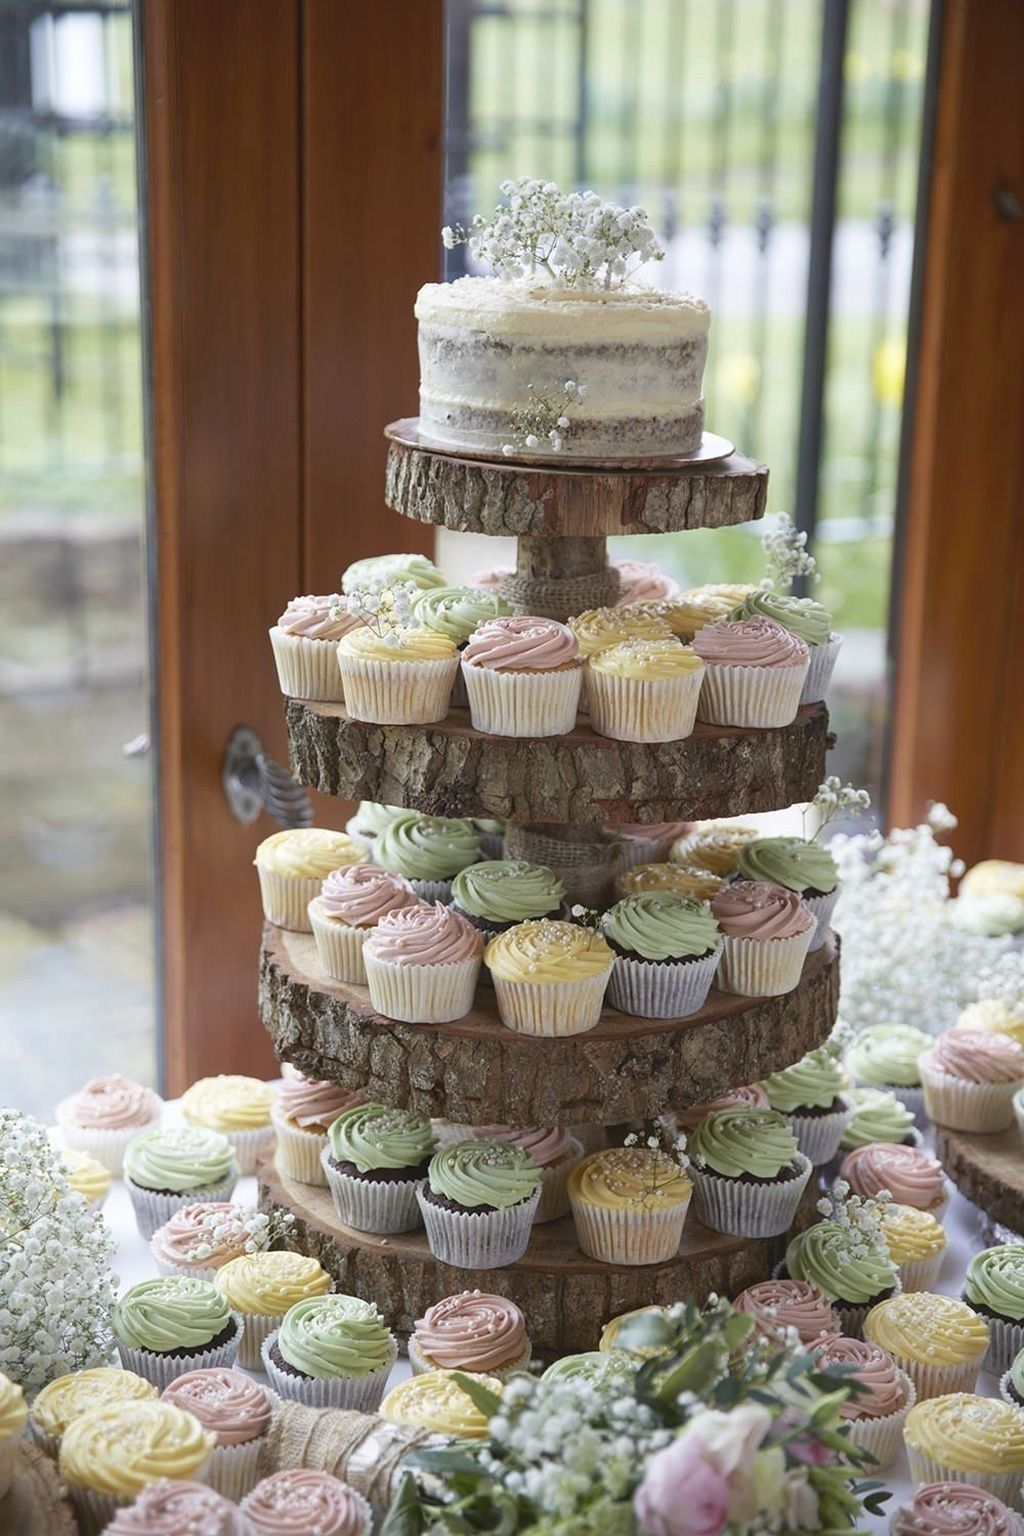 20+ Cute Wedding Cake Cupcakes Ideas Diy wedding